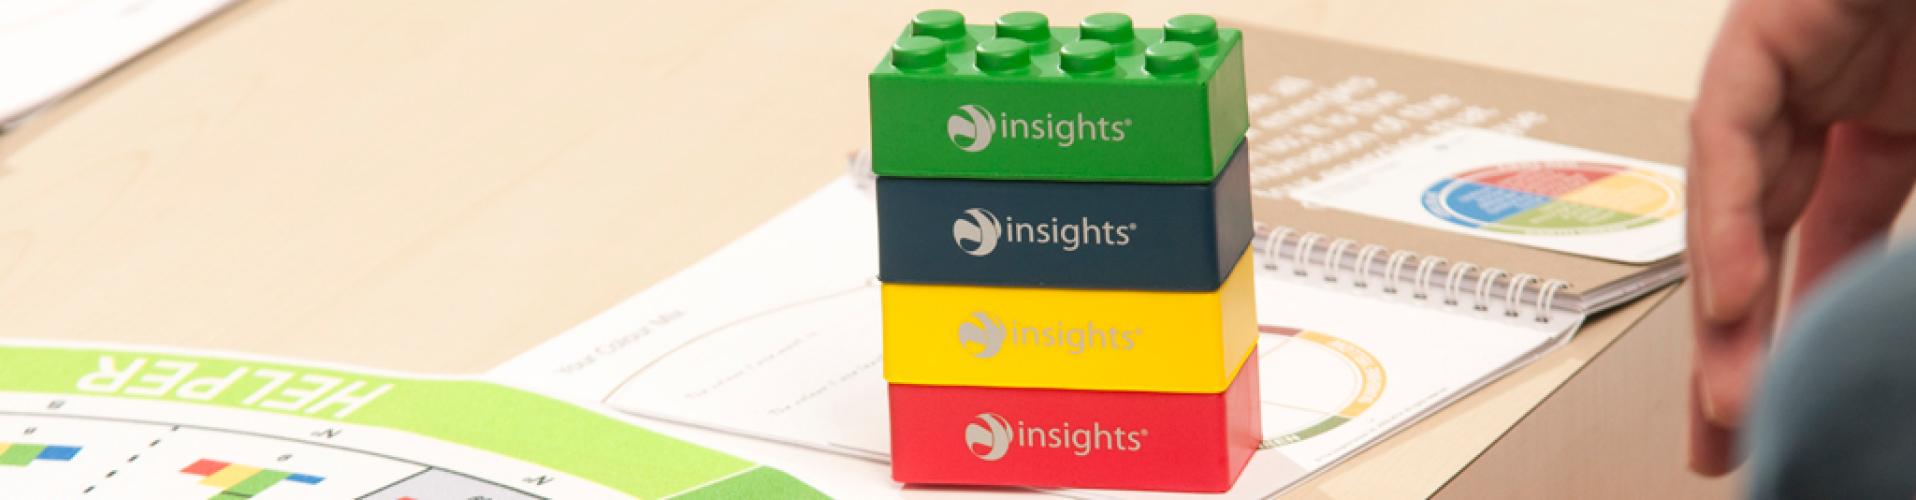 Gratis e-books van Insights Discovery